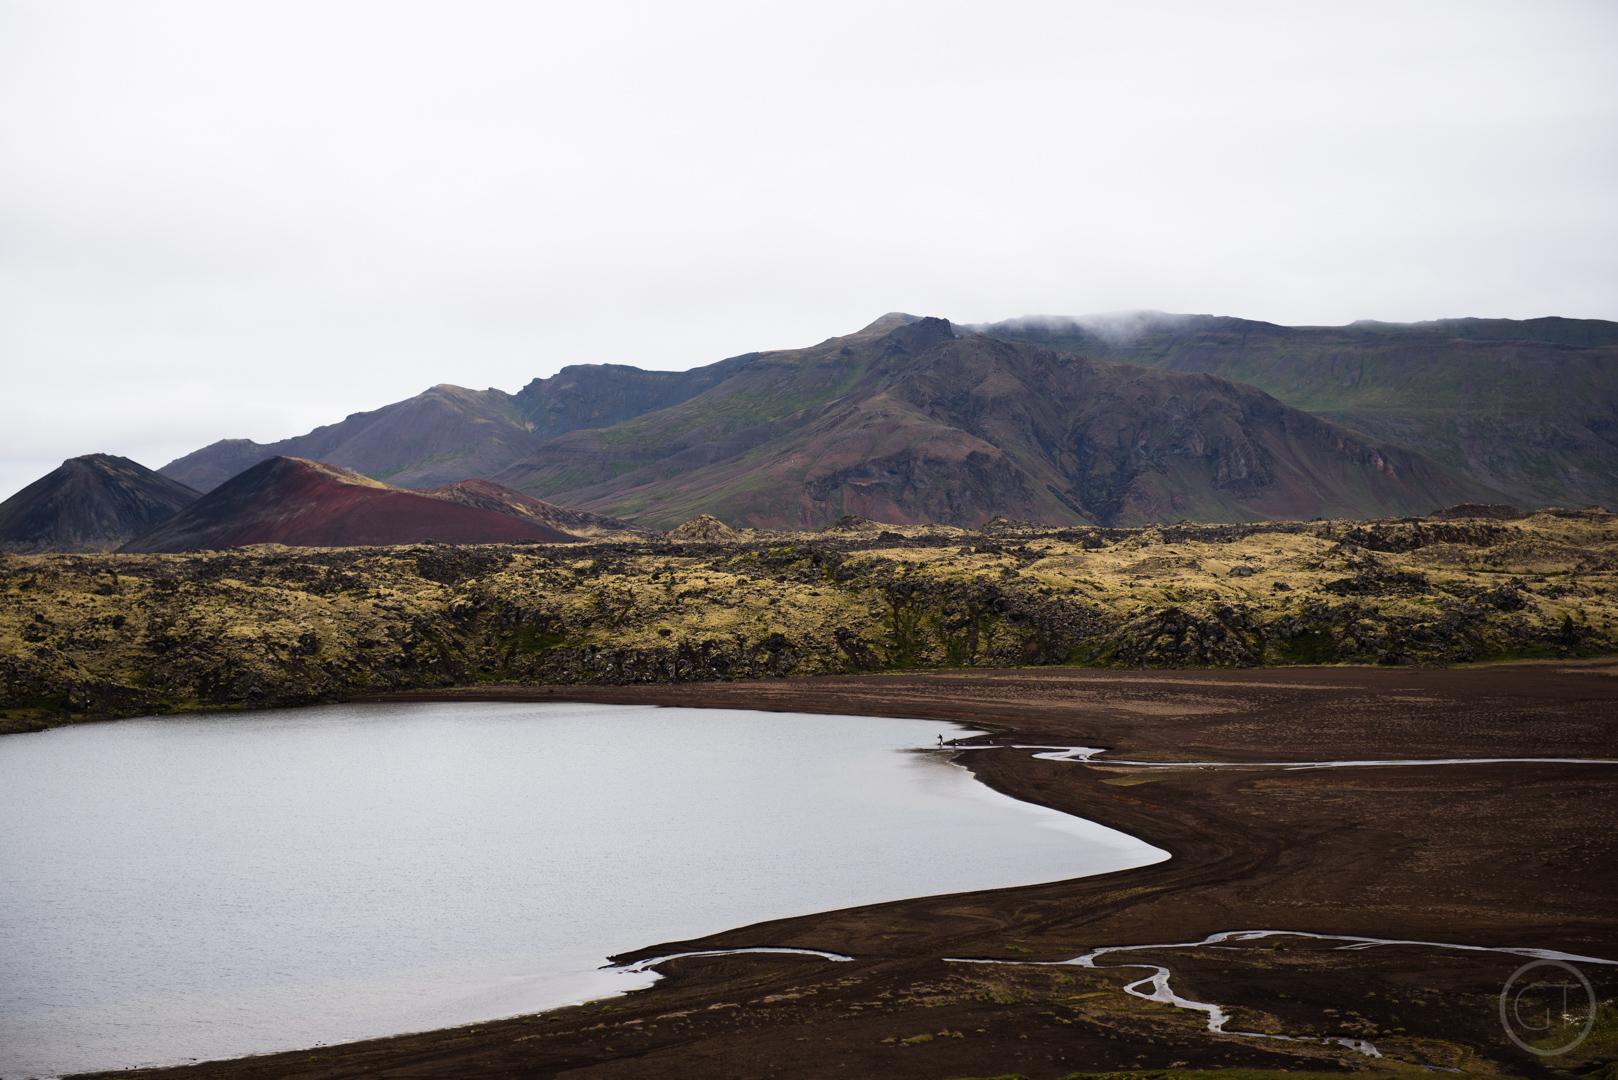 Iceland-gustav-thuesen-photography-landscape-nature-københavn-danmark-adventure-outdoor-lifestyle-4.jpg